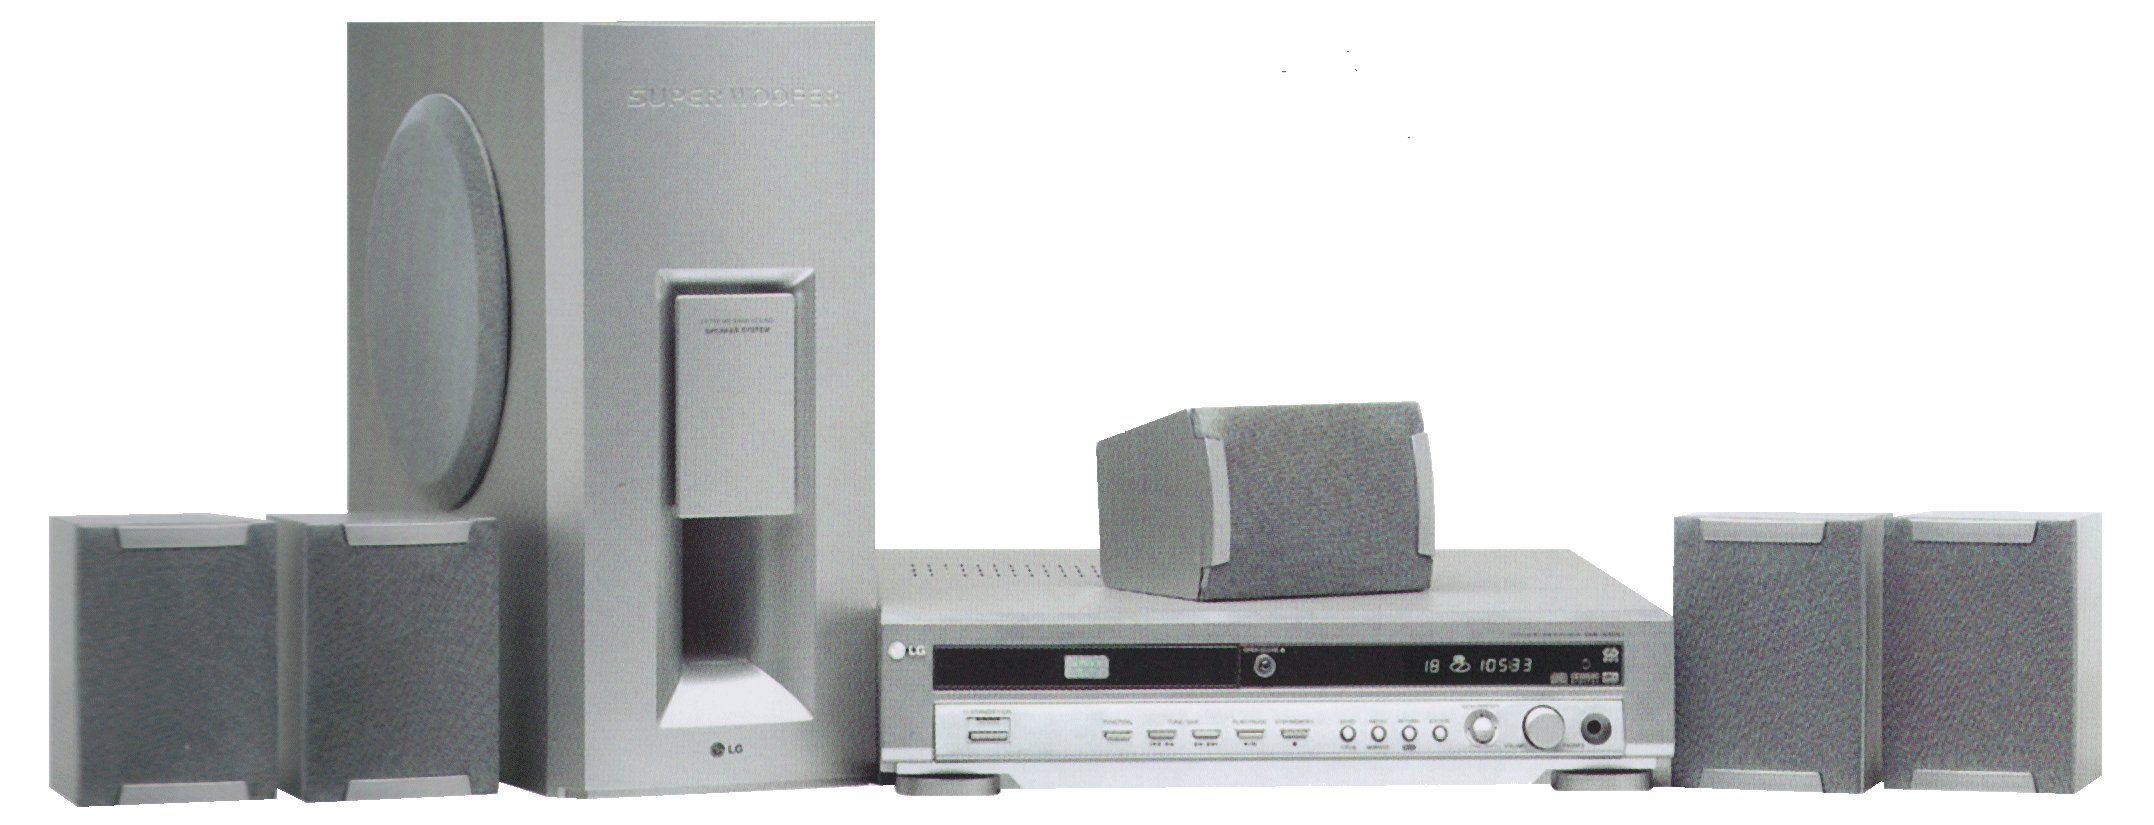 Lg dvd home cinema system model da-3520   House plans and ideas ...